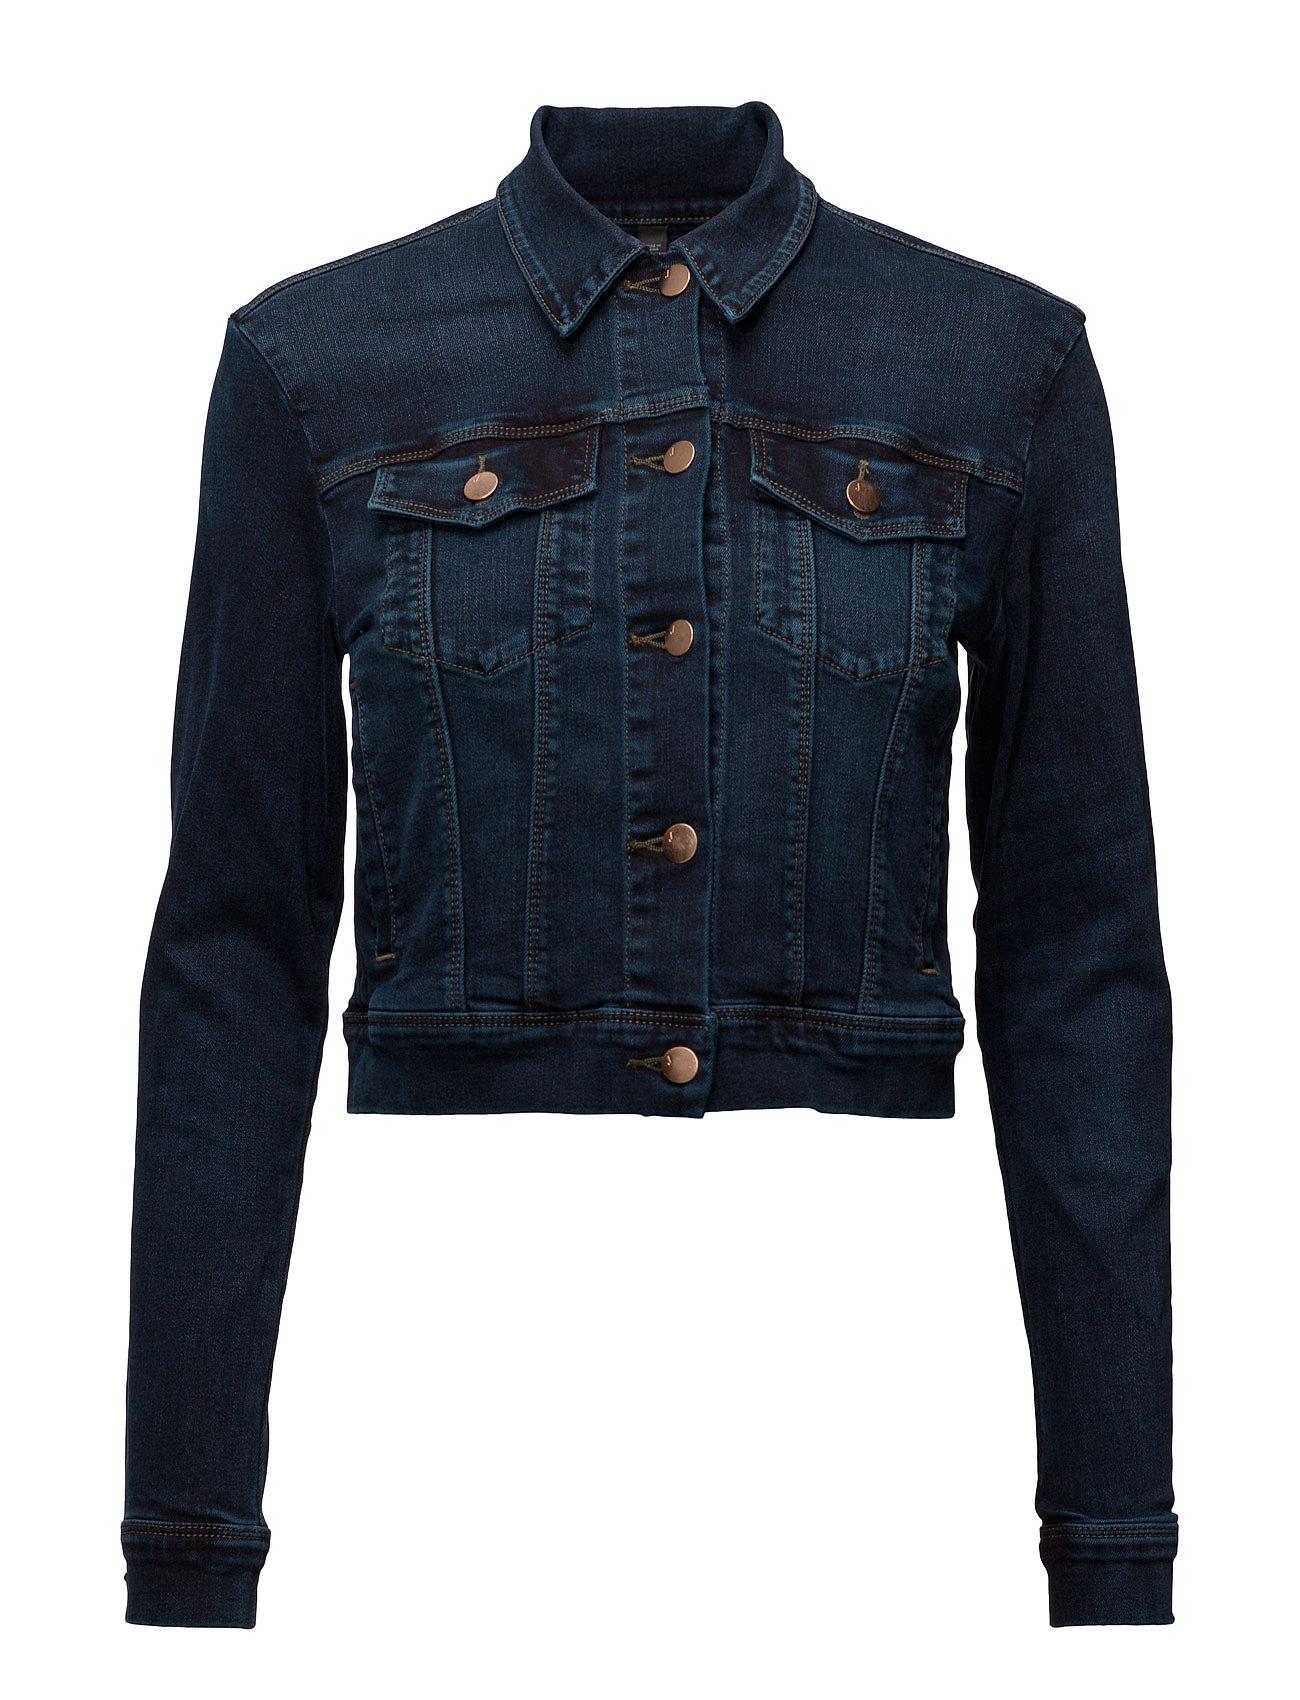 j brand T152 harlow shrunken jacket på boozt.com dk